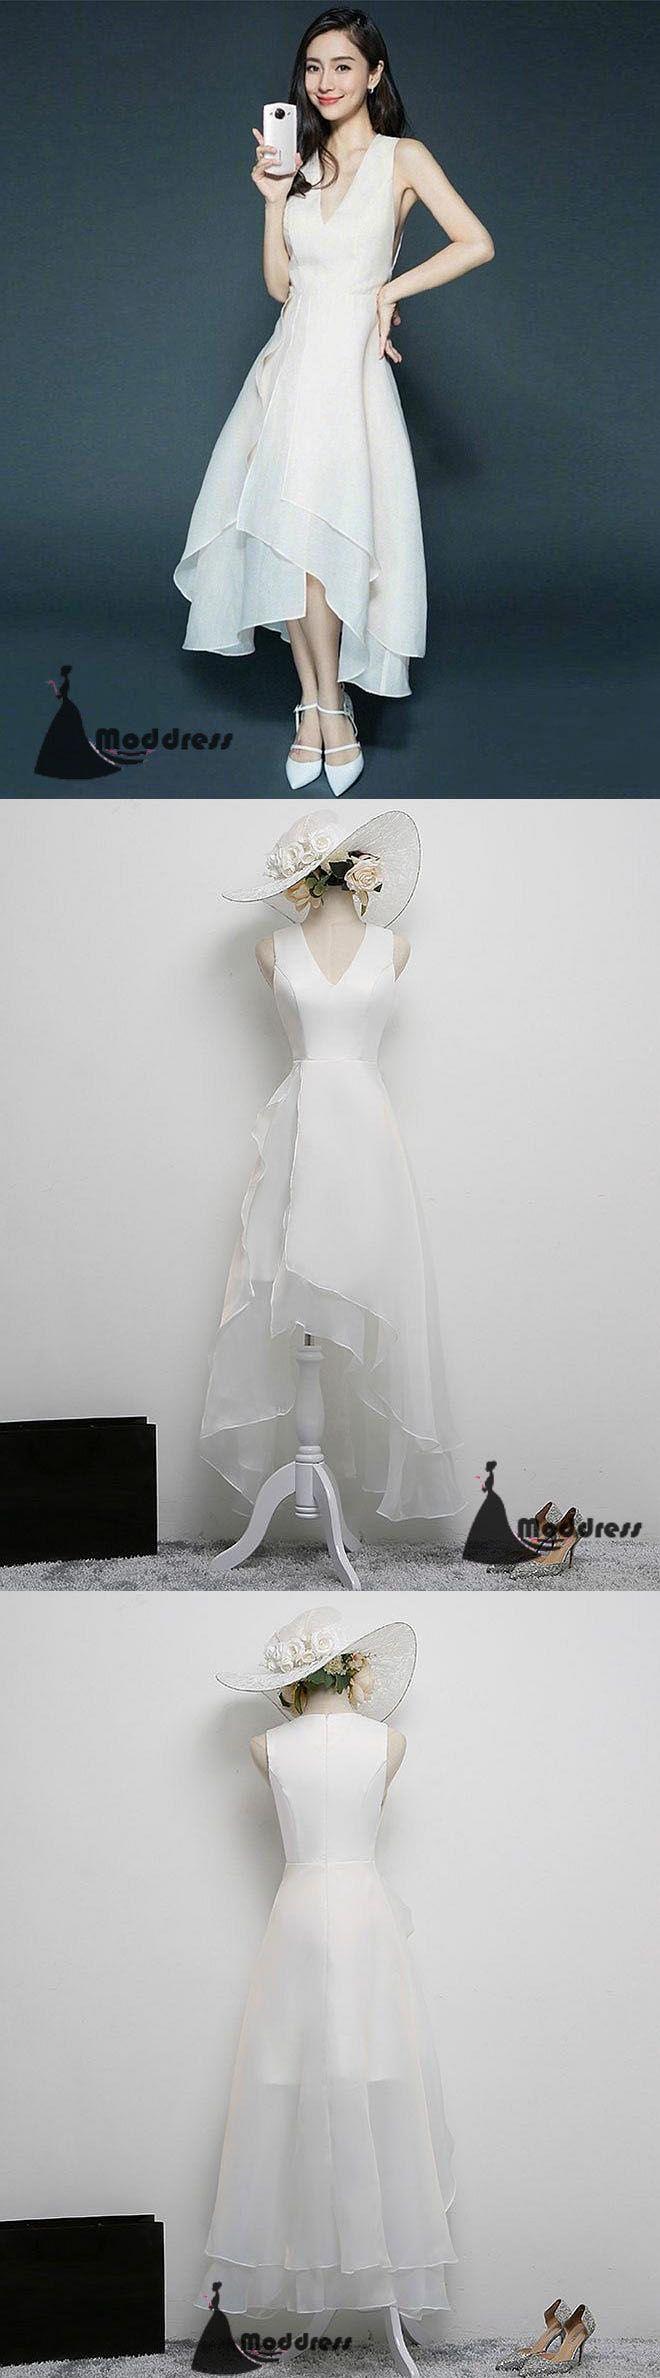 Simple short prom dress vneck white evening dress formal dress